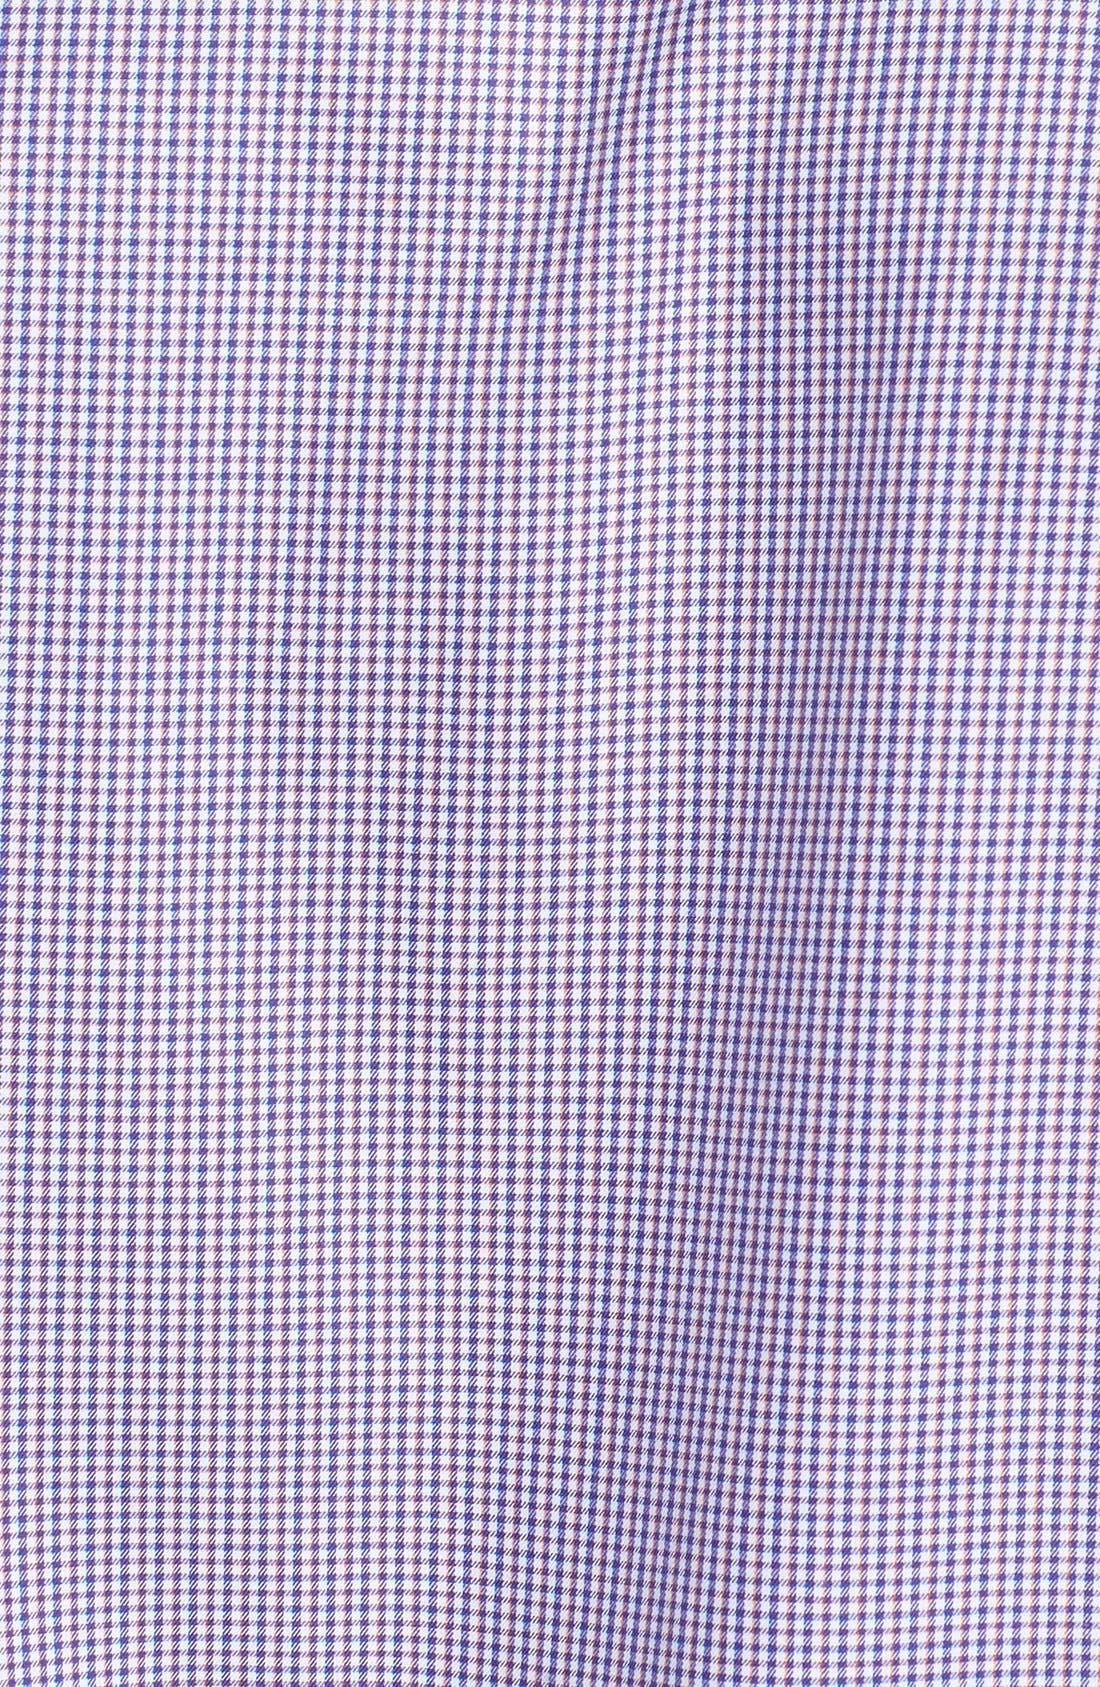 Alternate Image 3  - Robert Talbott Classic Fit Sport Shirt